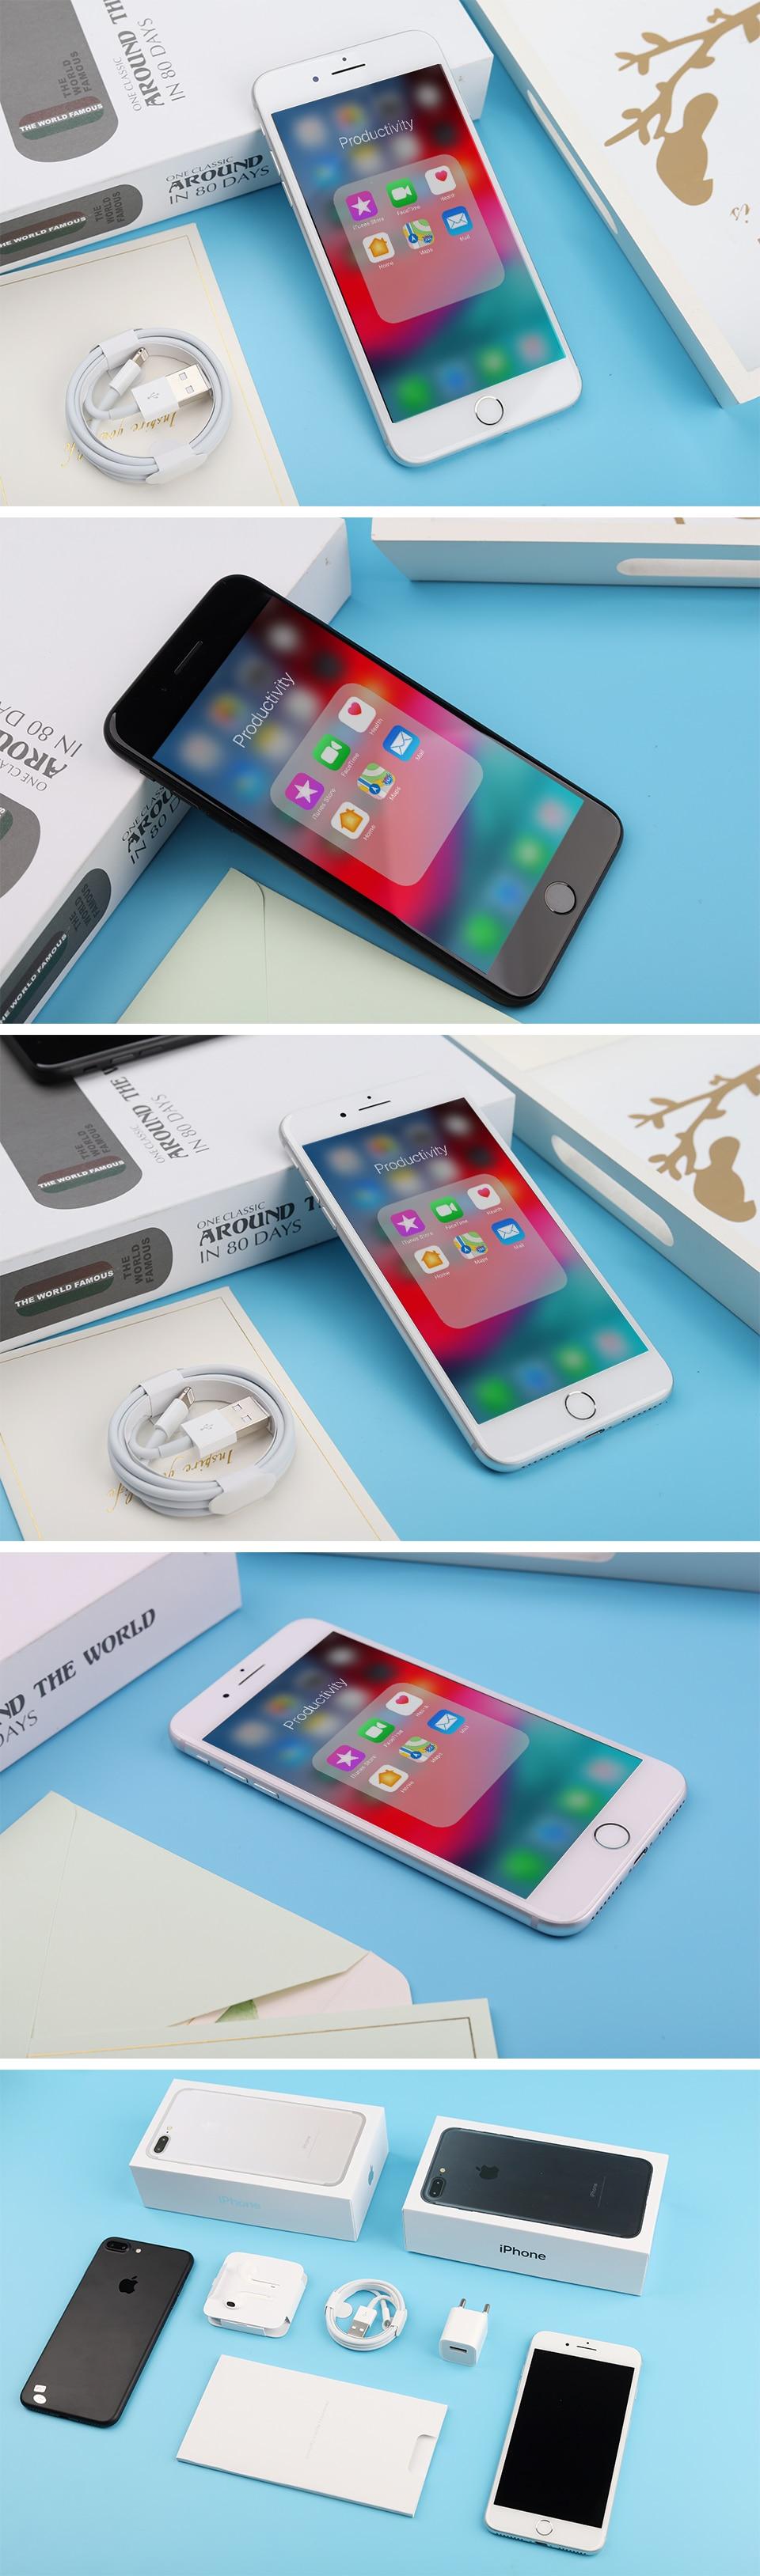 iPhone-7-plus--详情页_06